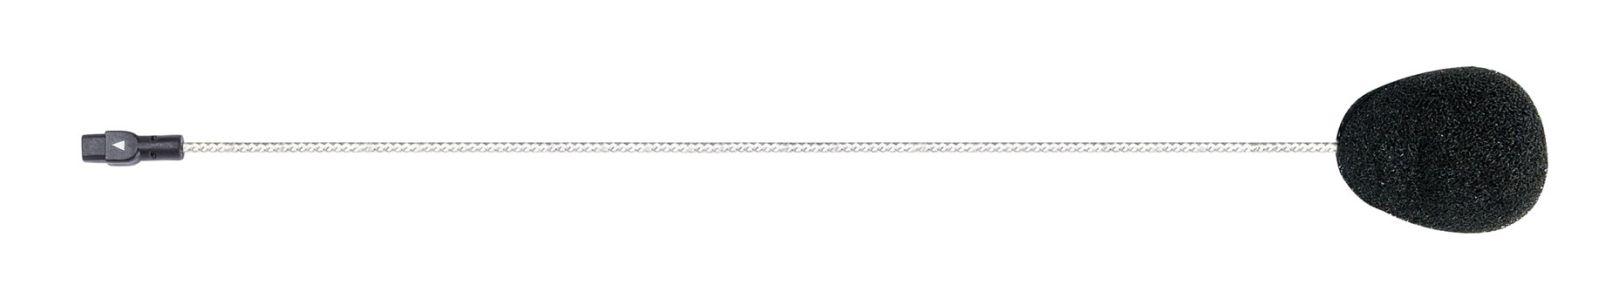 BT PRO フルフェイス用ワイヤーマイク L1343[普通郵便可]